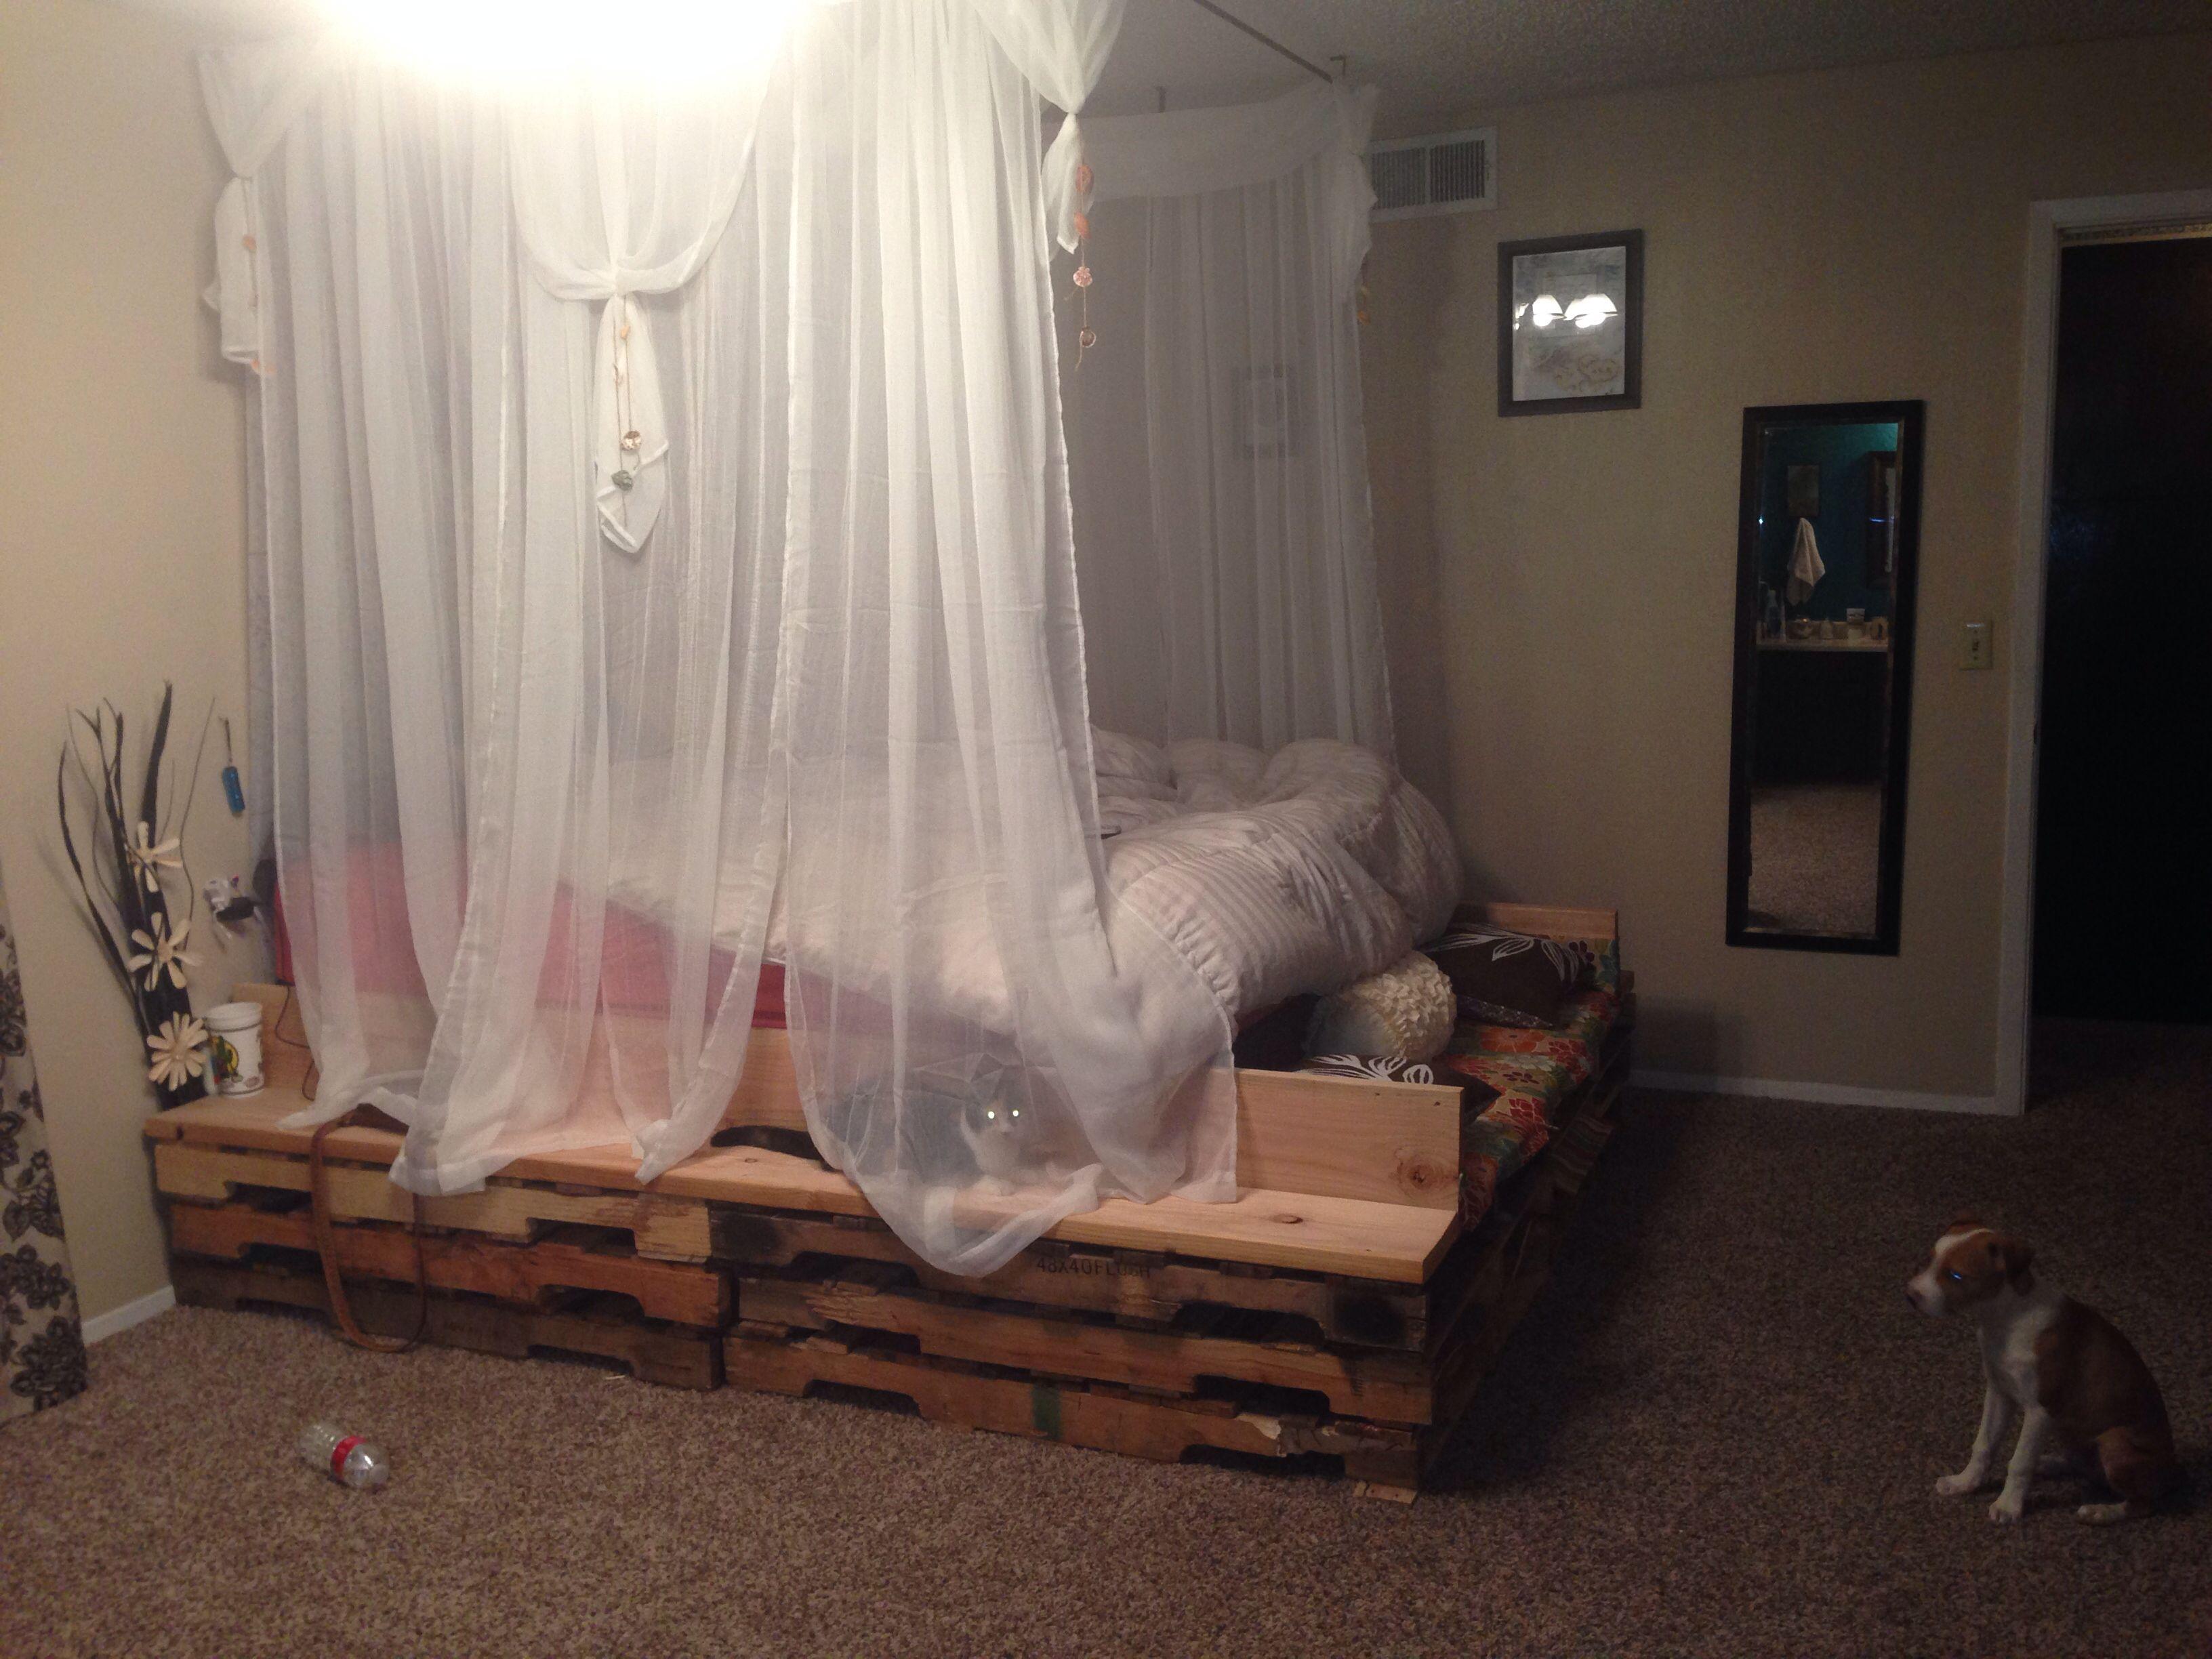 Diy Bed Canopy Ideas Part - 35: DIY Pallet Bed U0026 Canopy